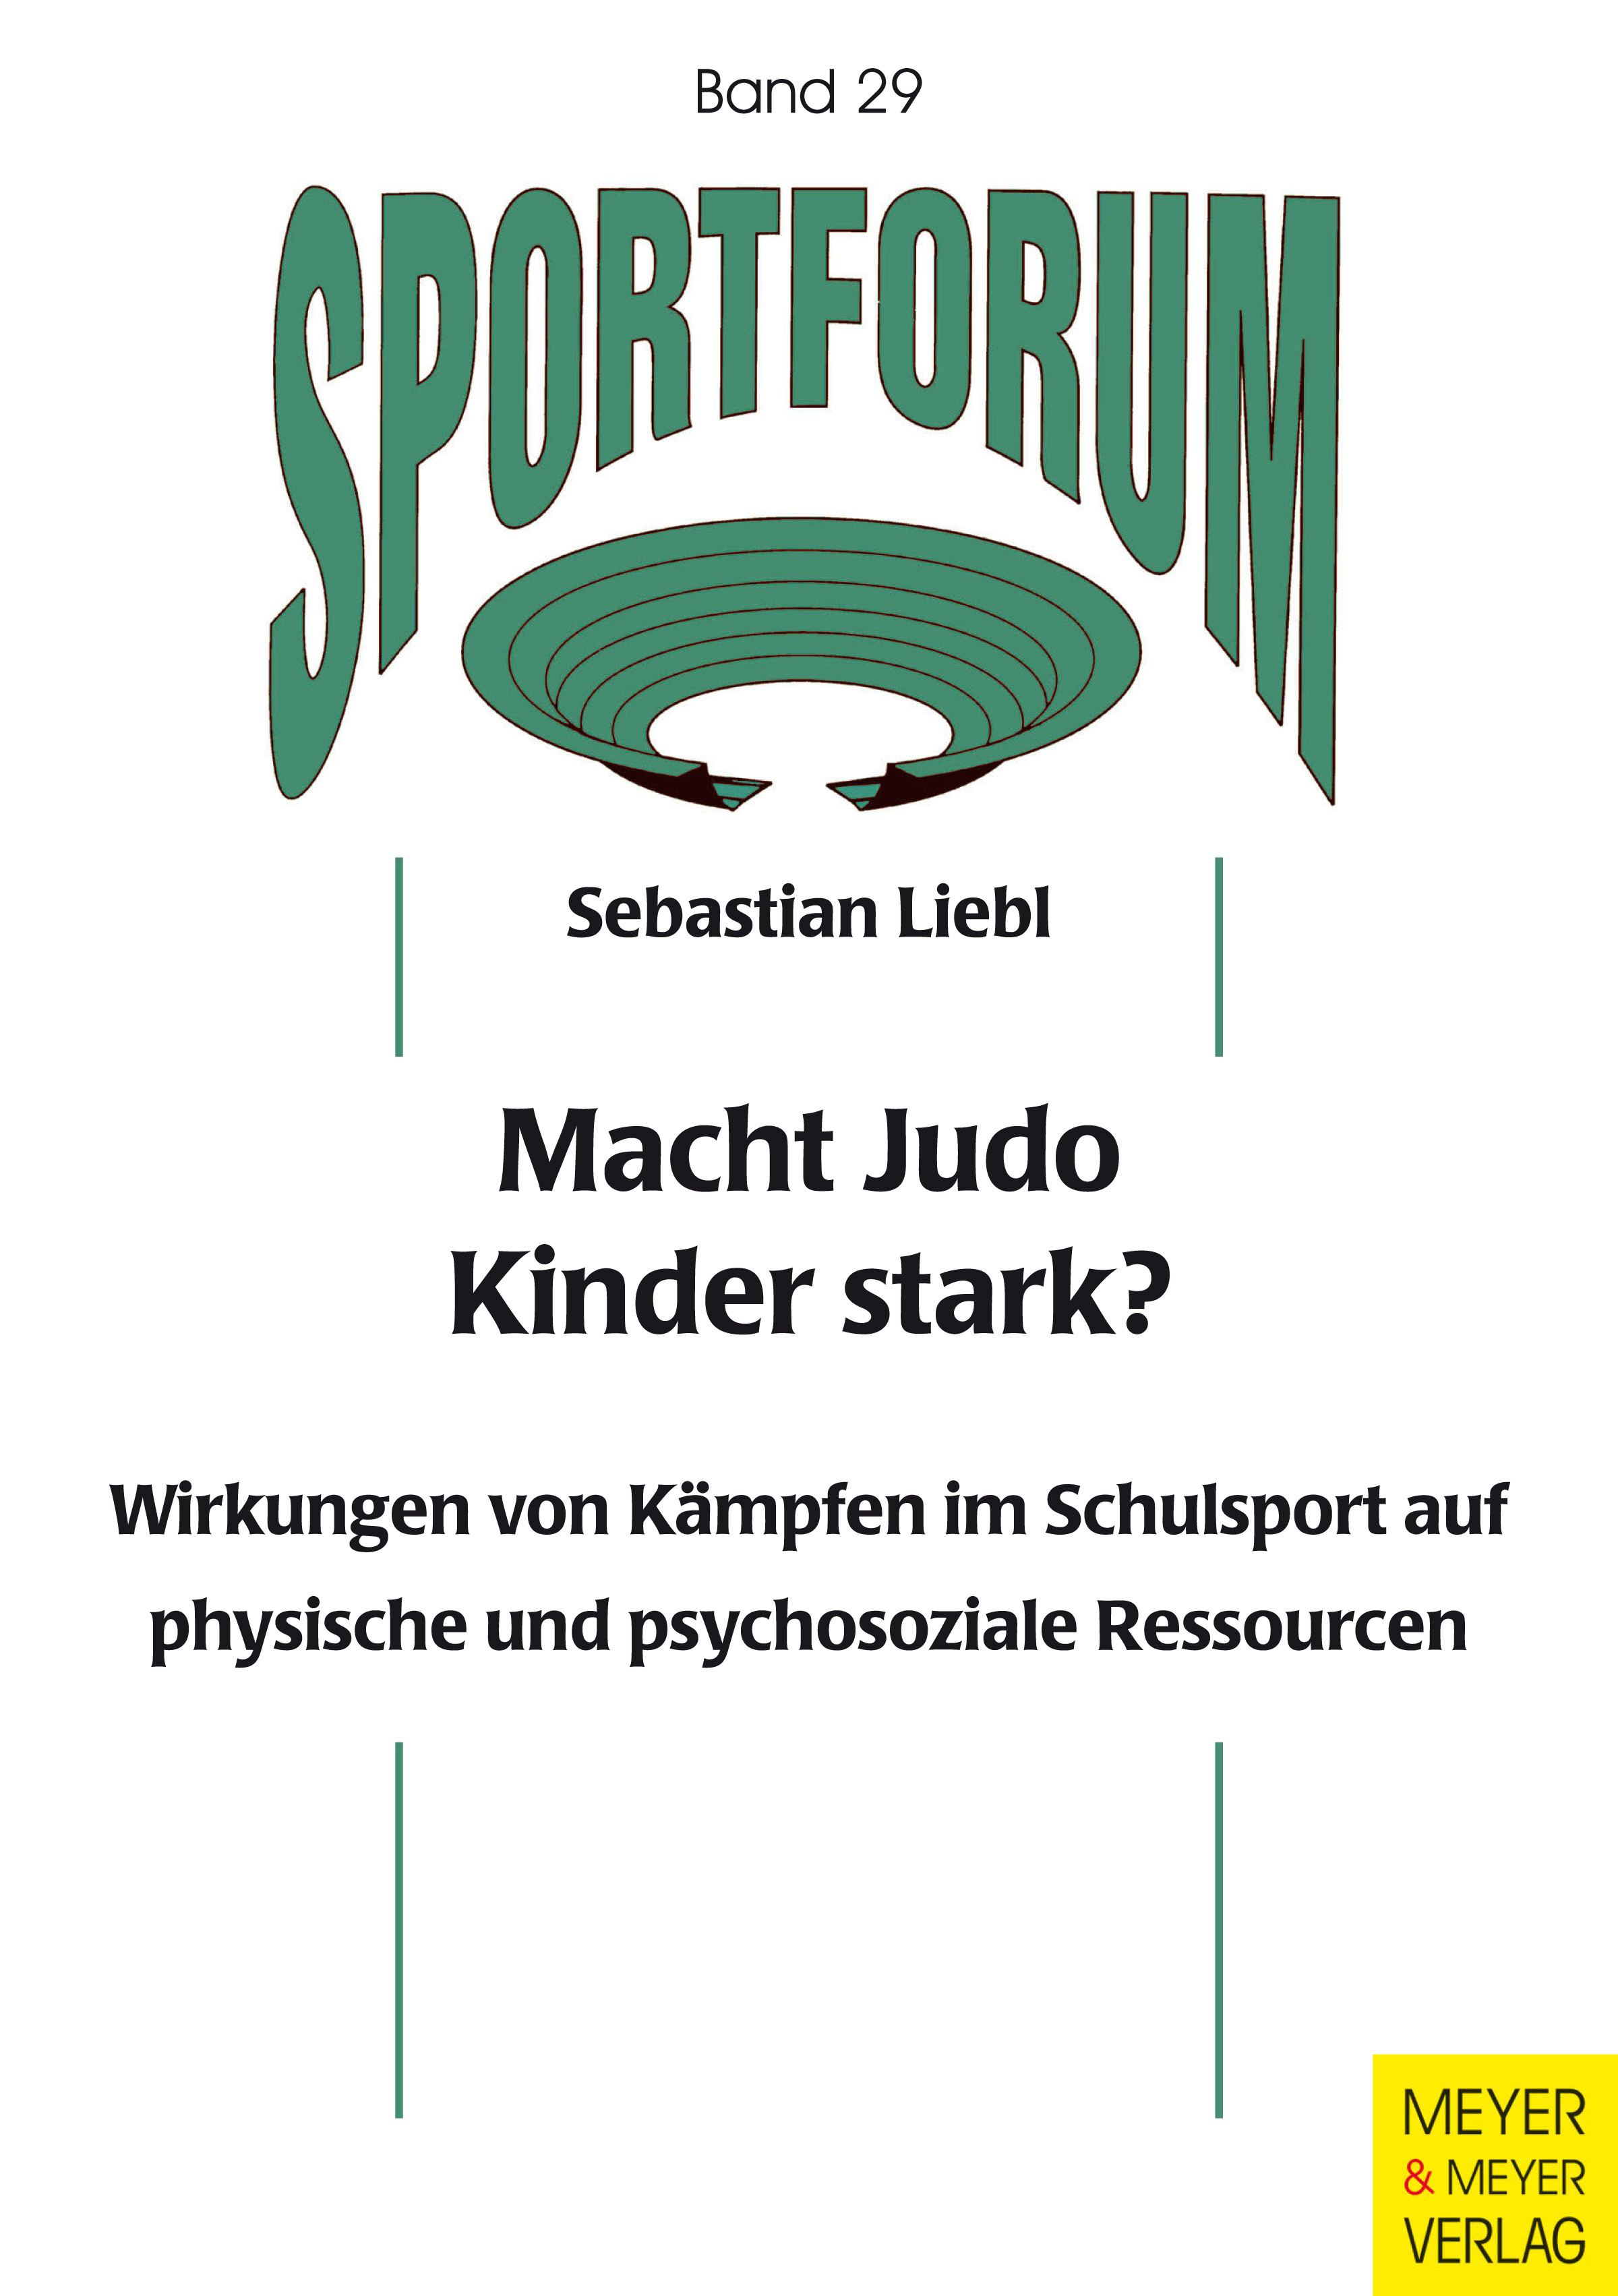 Sebastian Liebl Macht Judo Kinder stark? шоколадное яйцо kinder kinder joy 20 г